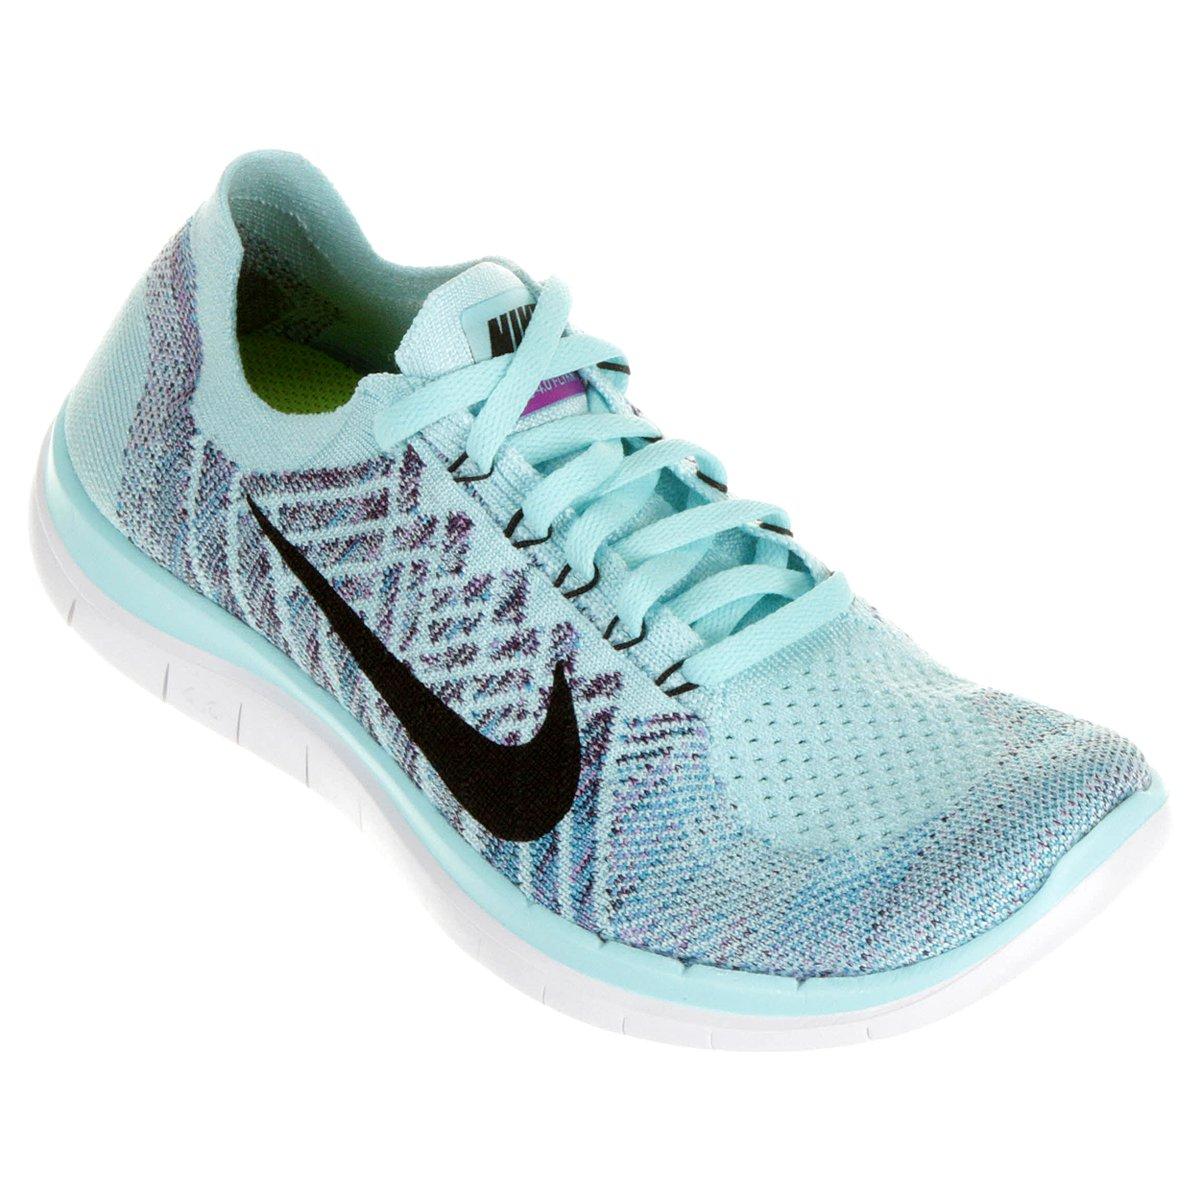 6f3bd7ee093 ... Tênis Nike Free 4.0 Flyknit - Azul Piscina ...